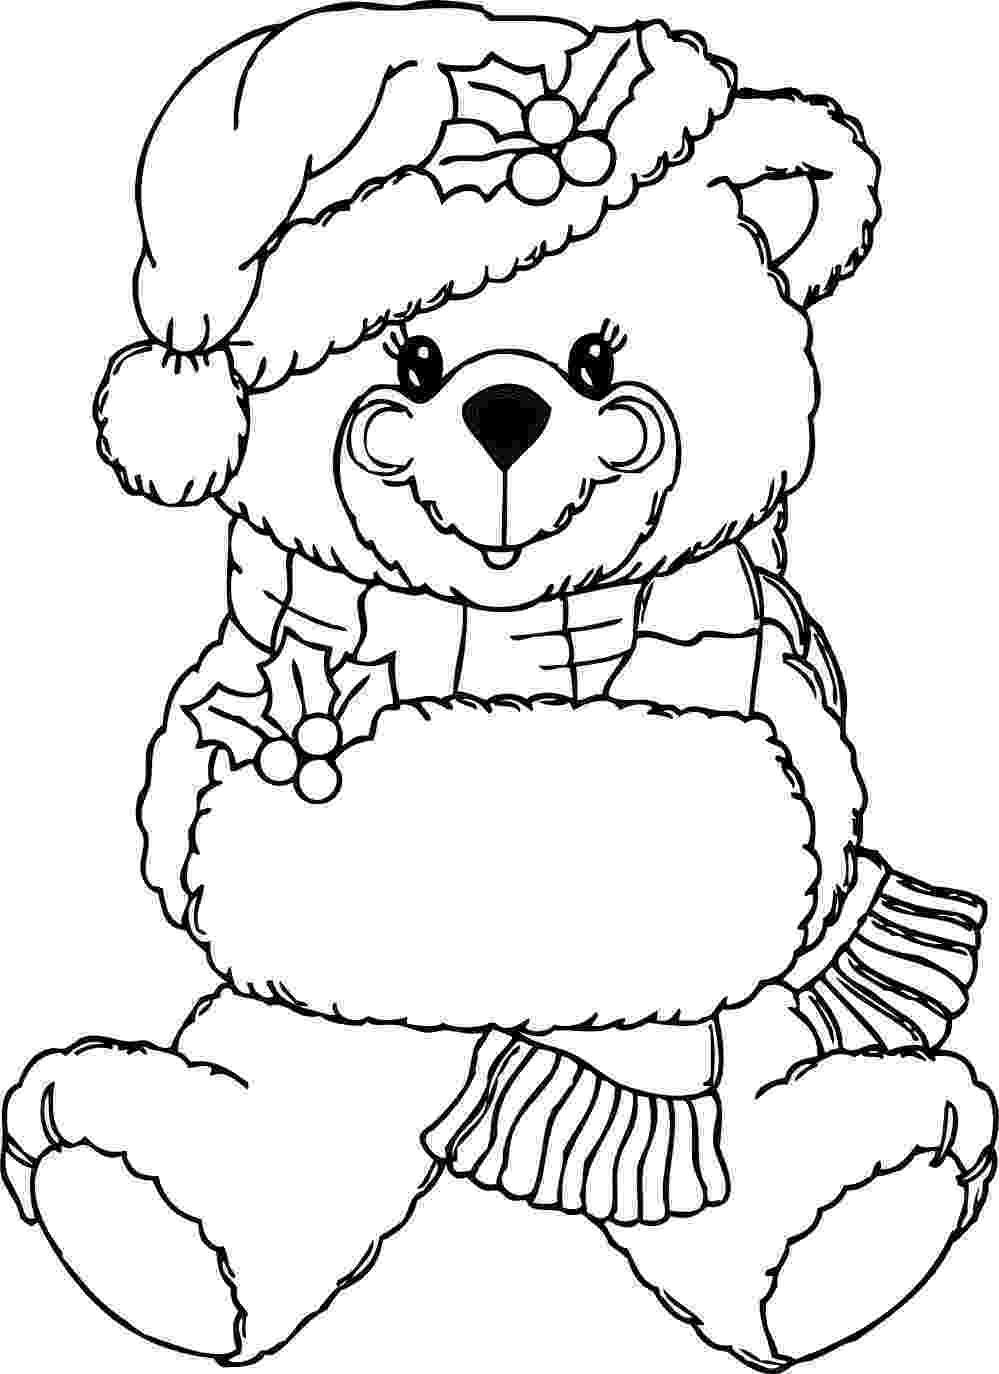 coloring sheet teddy bear free printable teddy bear coloring pages for kids teddy coloring sheet bear